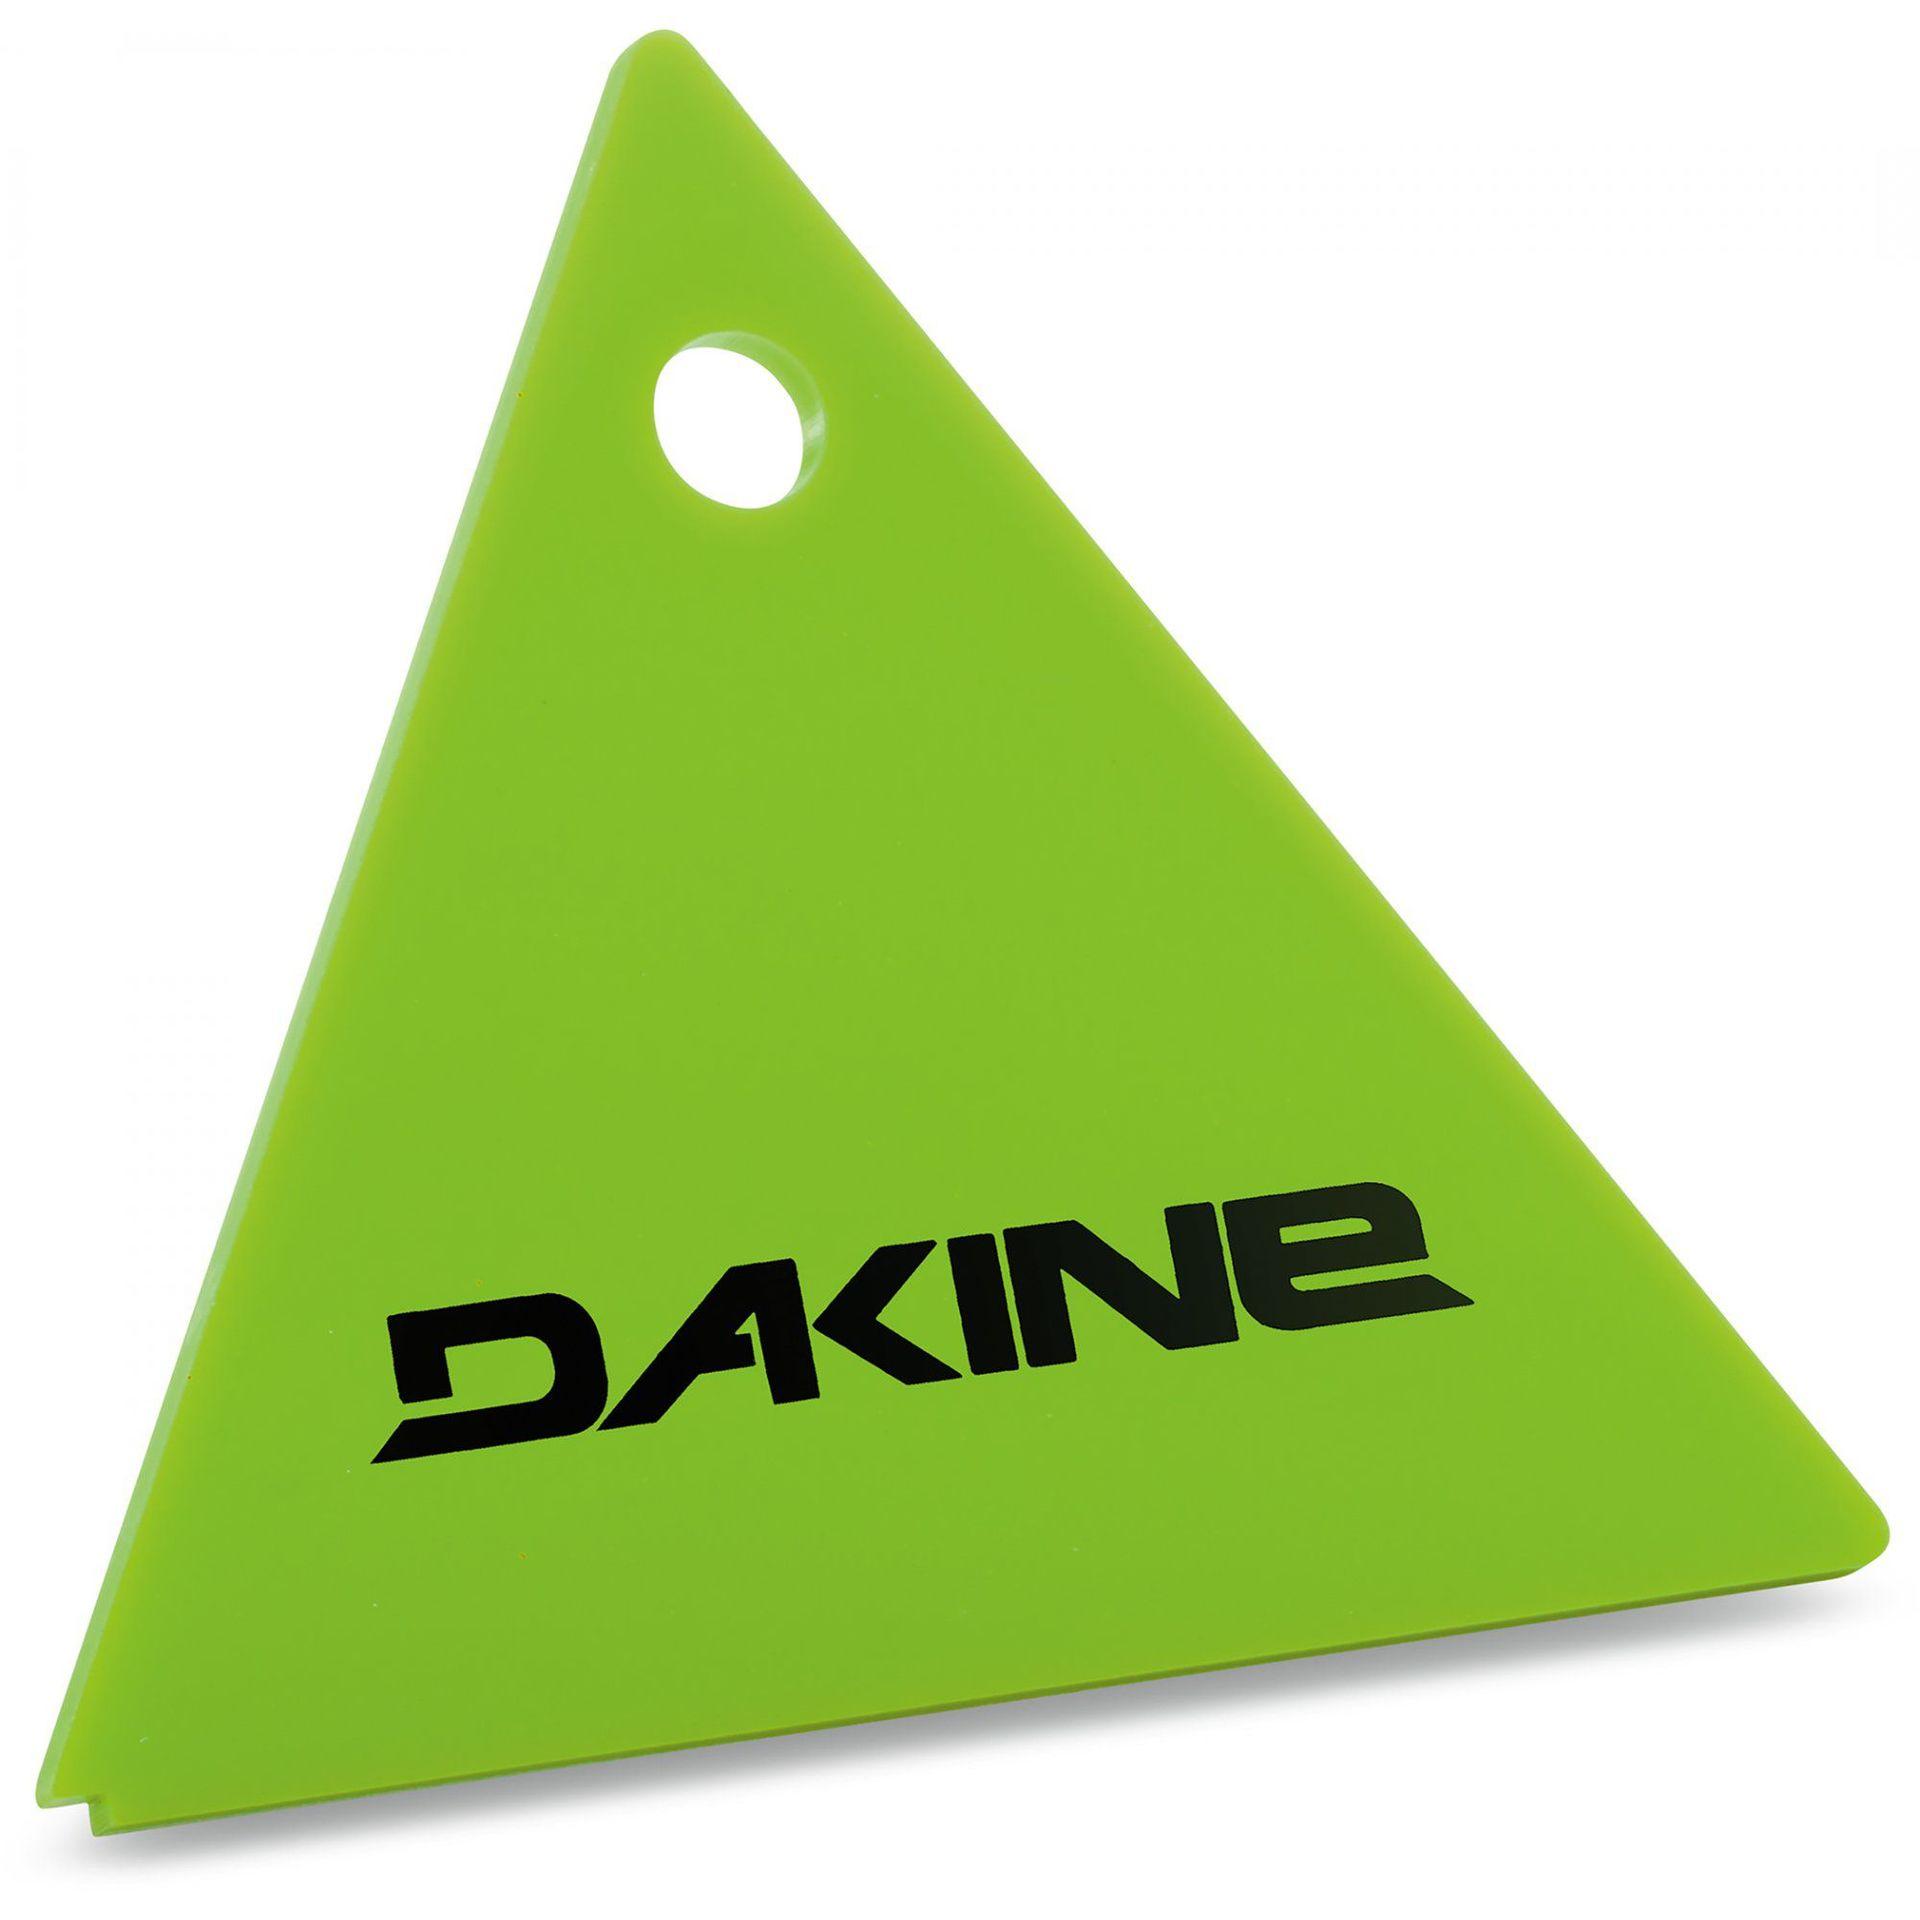 CYKLINA DAKINE TRIANGLE SCRAPER GREEN